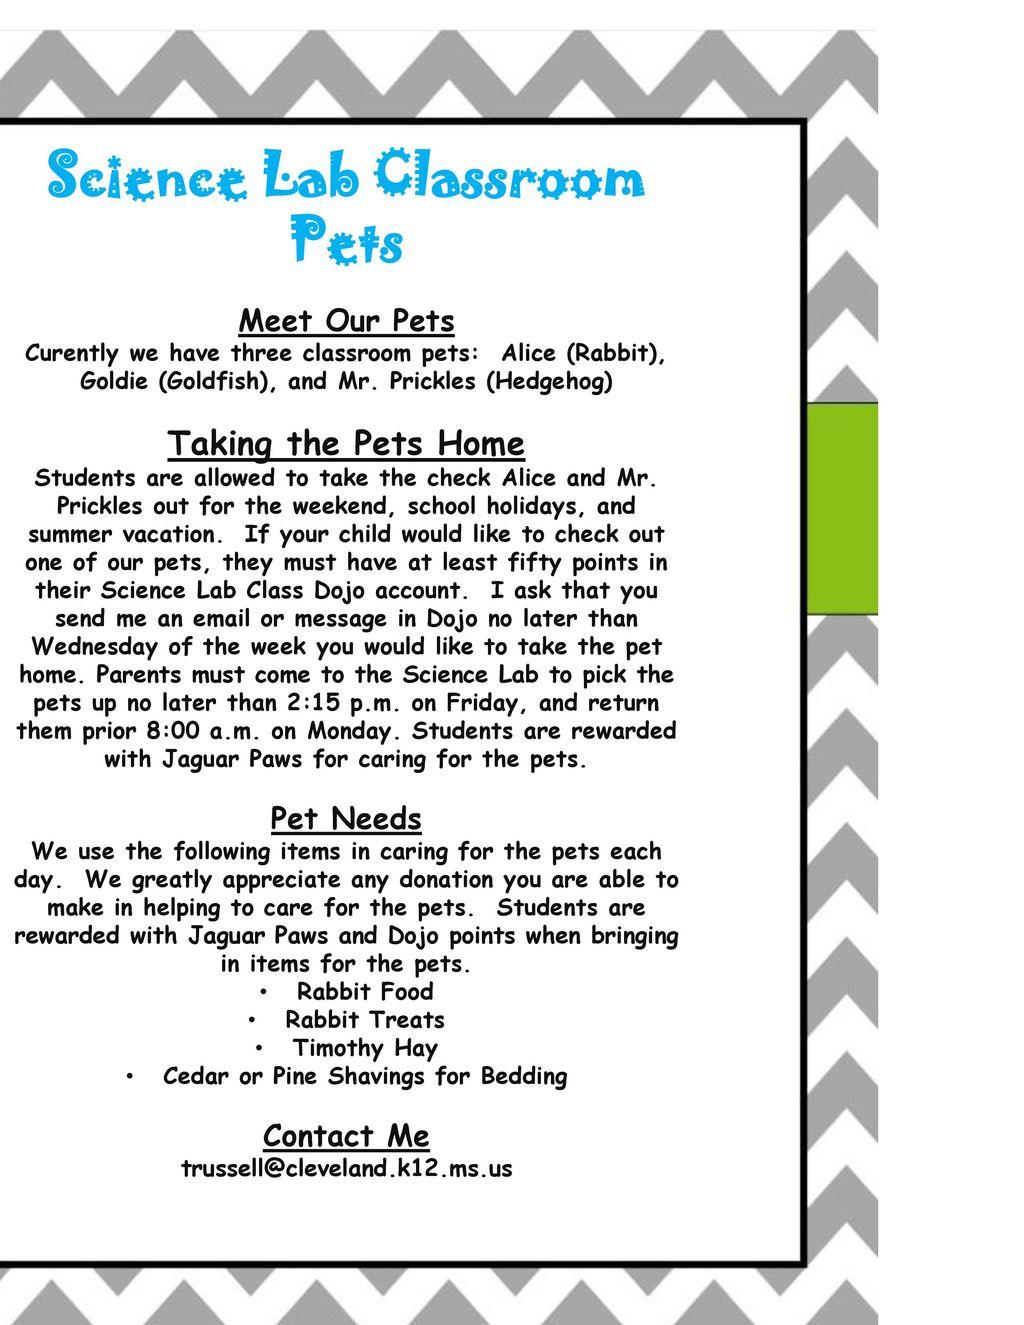 Science Lab Classroom Pets Cedar or Pine Shavings for